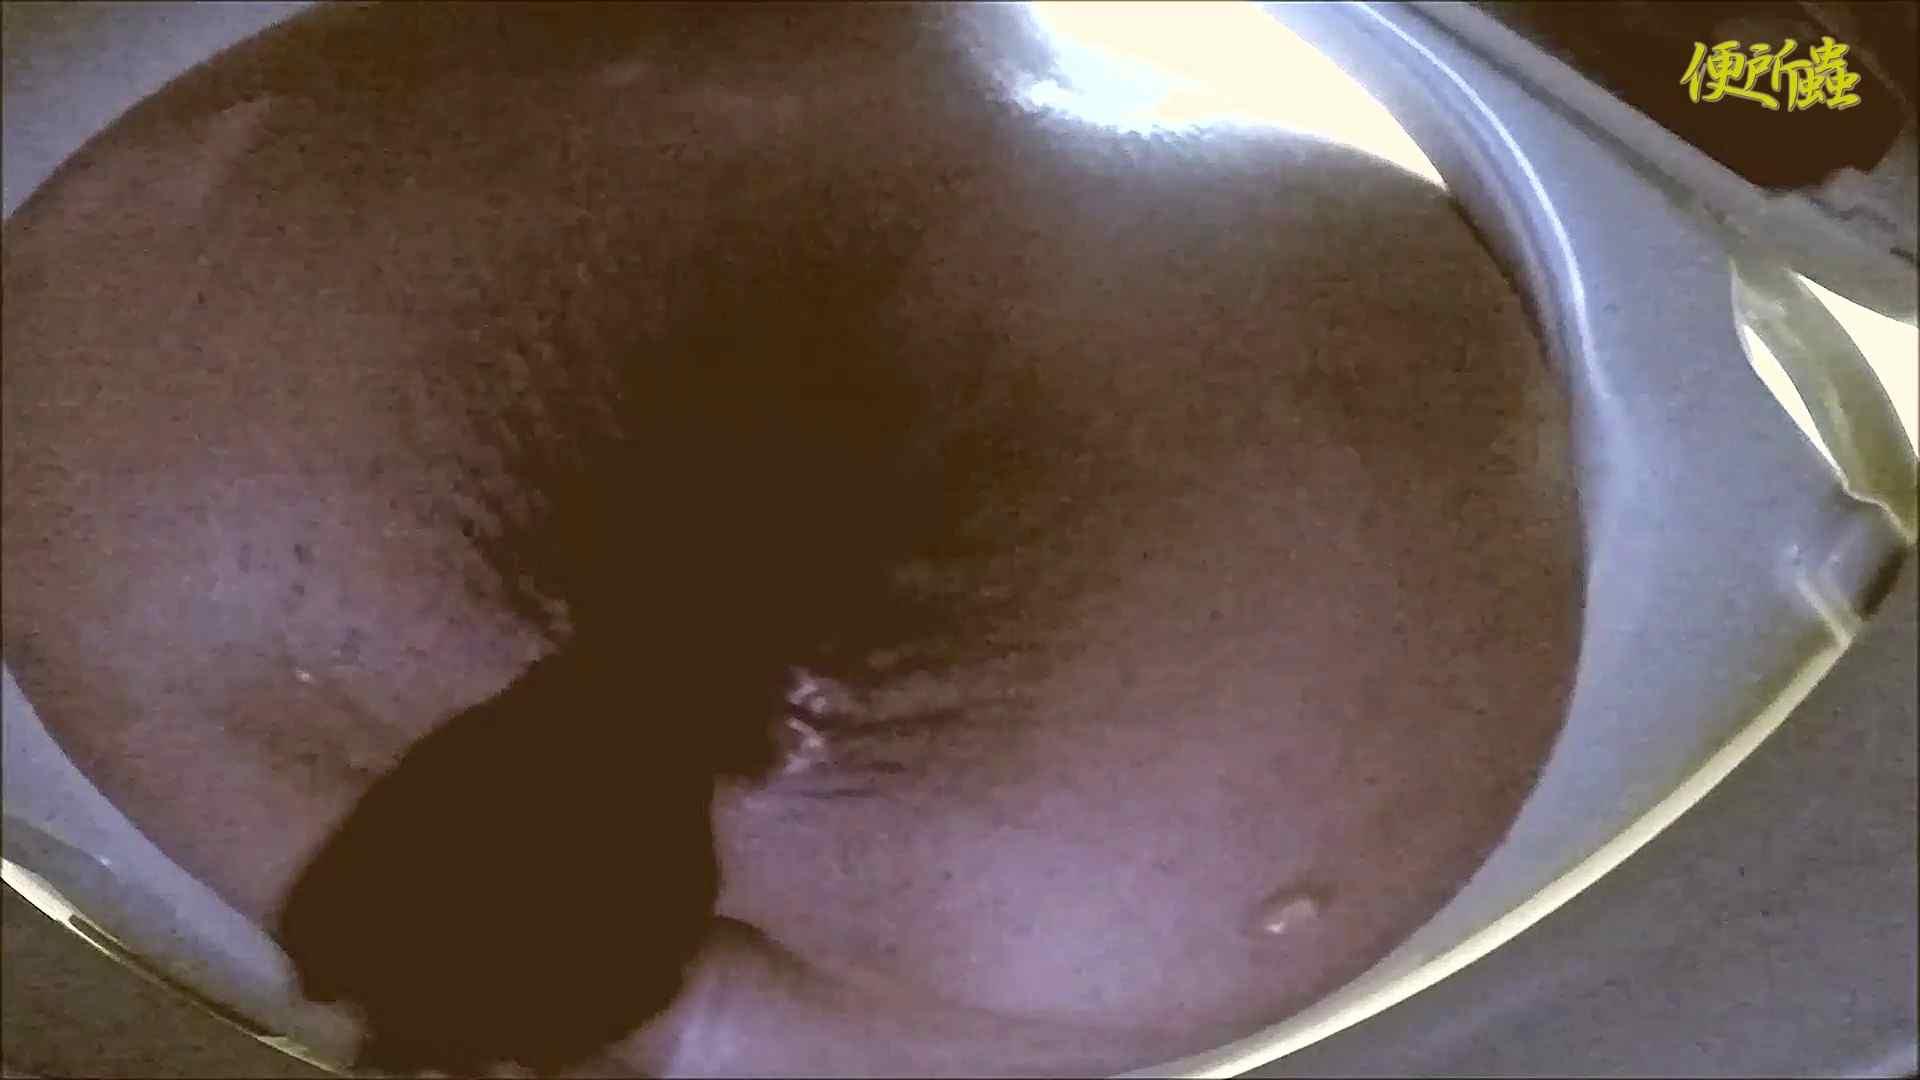 vol.12 便所蟲さんのリターン~寺子屋洗面所盗撮~ 便器 盗撮ヌード画像 99pic 54